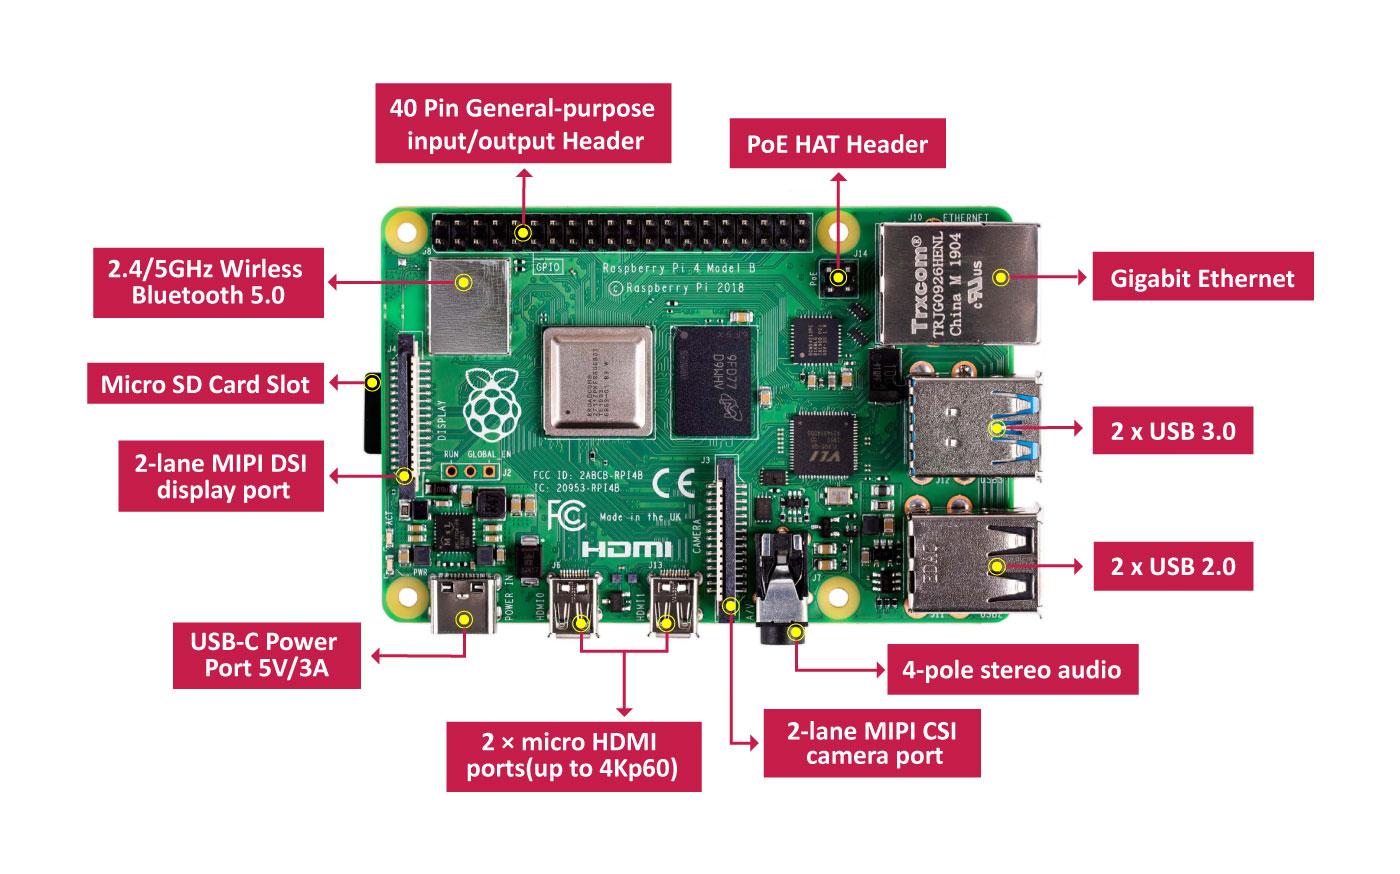 raspberry-pi-4-model-b-6.png